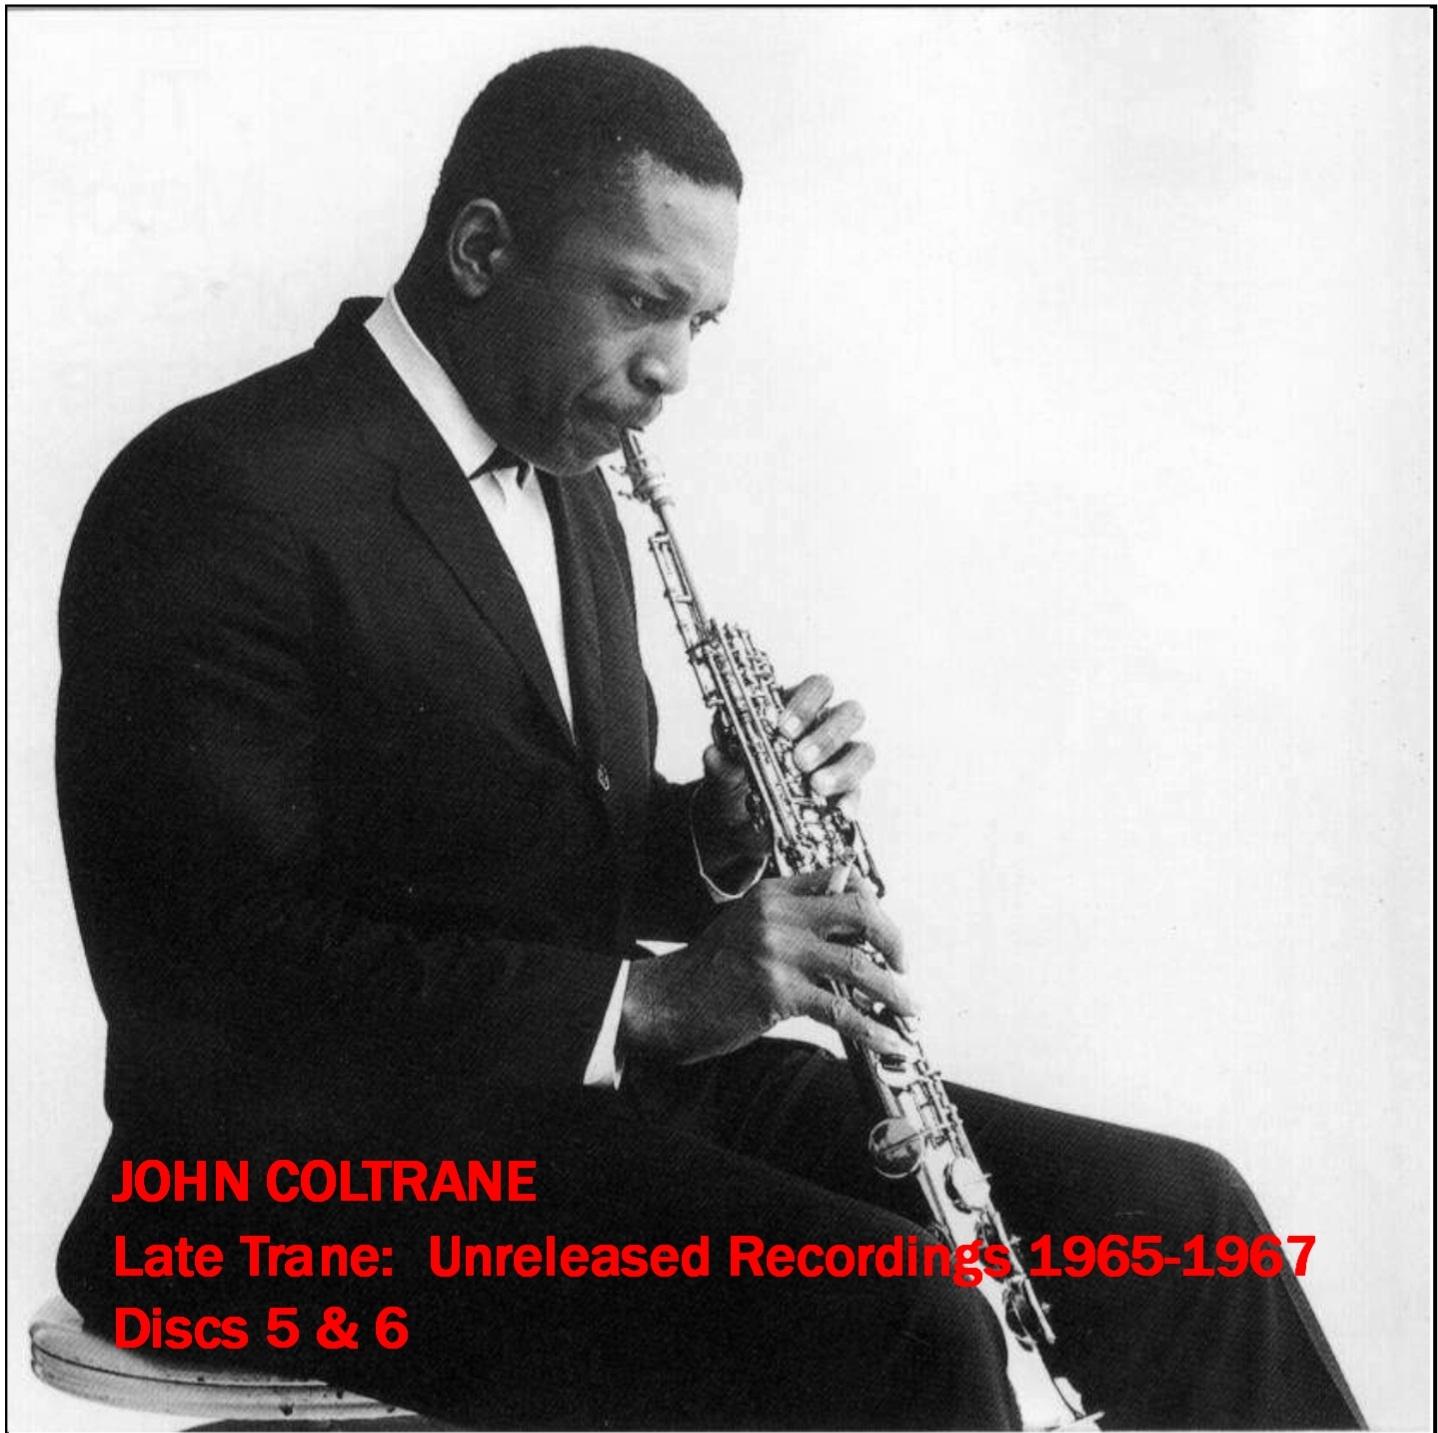 JohnColtrane1965-1967LateTraneCollection_pt2.jpg